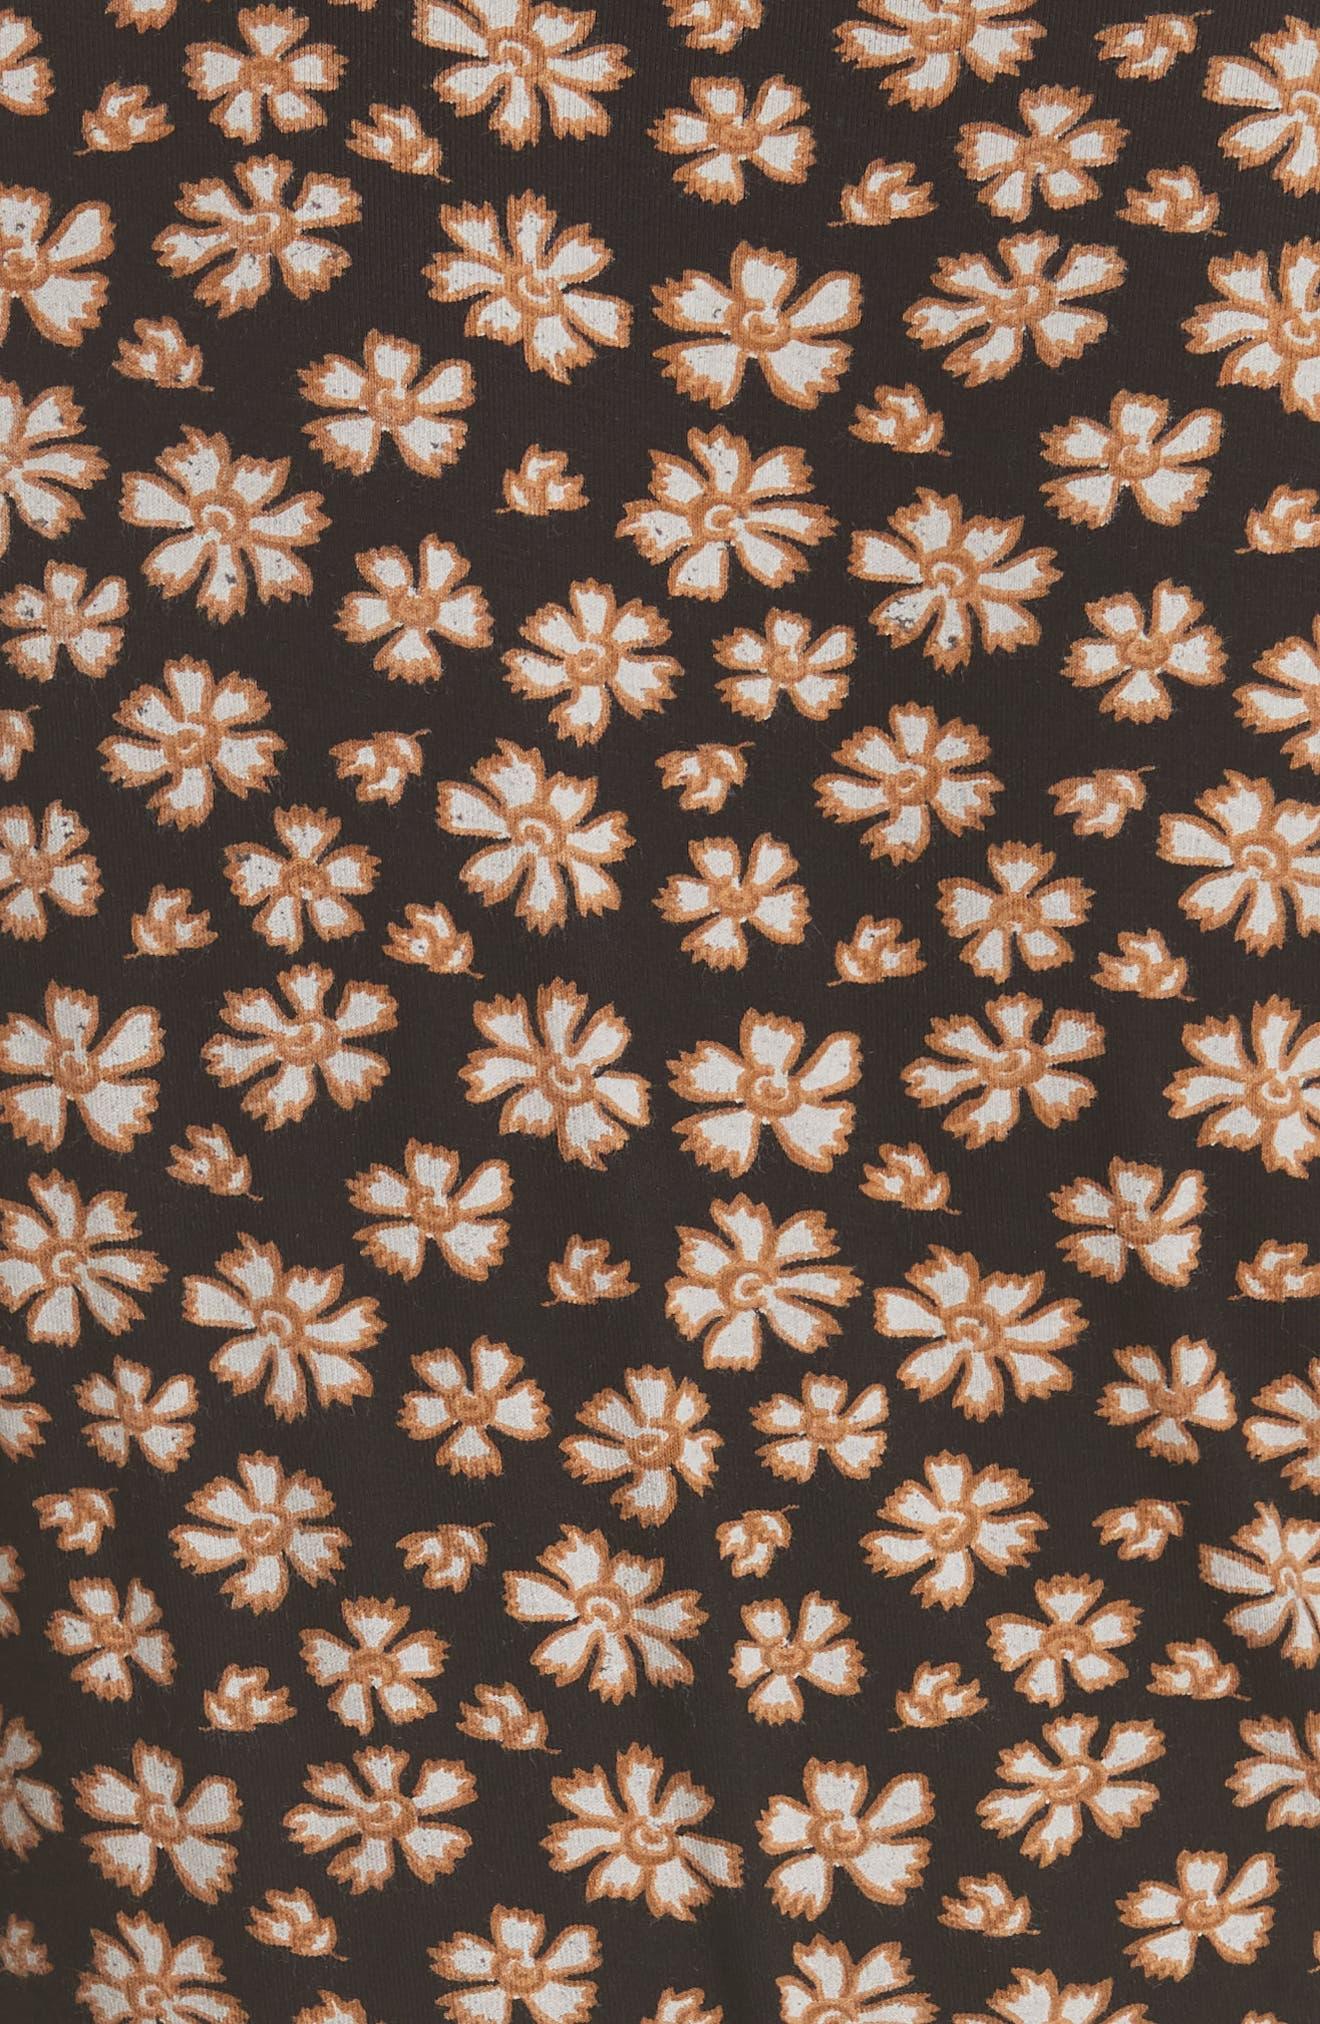 Pradera Floral Minidress,                             Alternate thumbnail 6, color,                             001